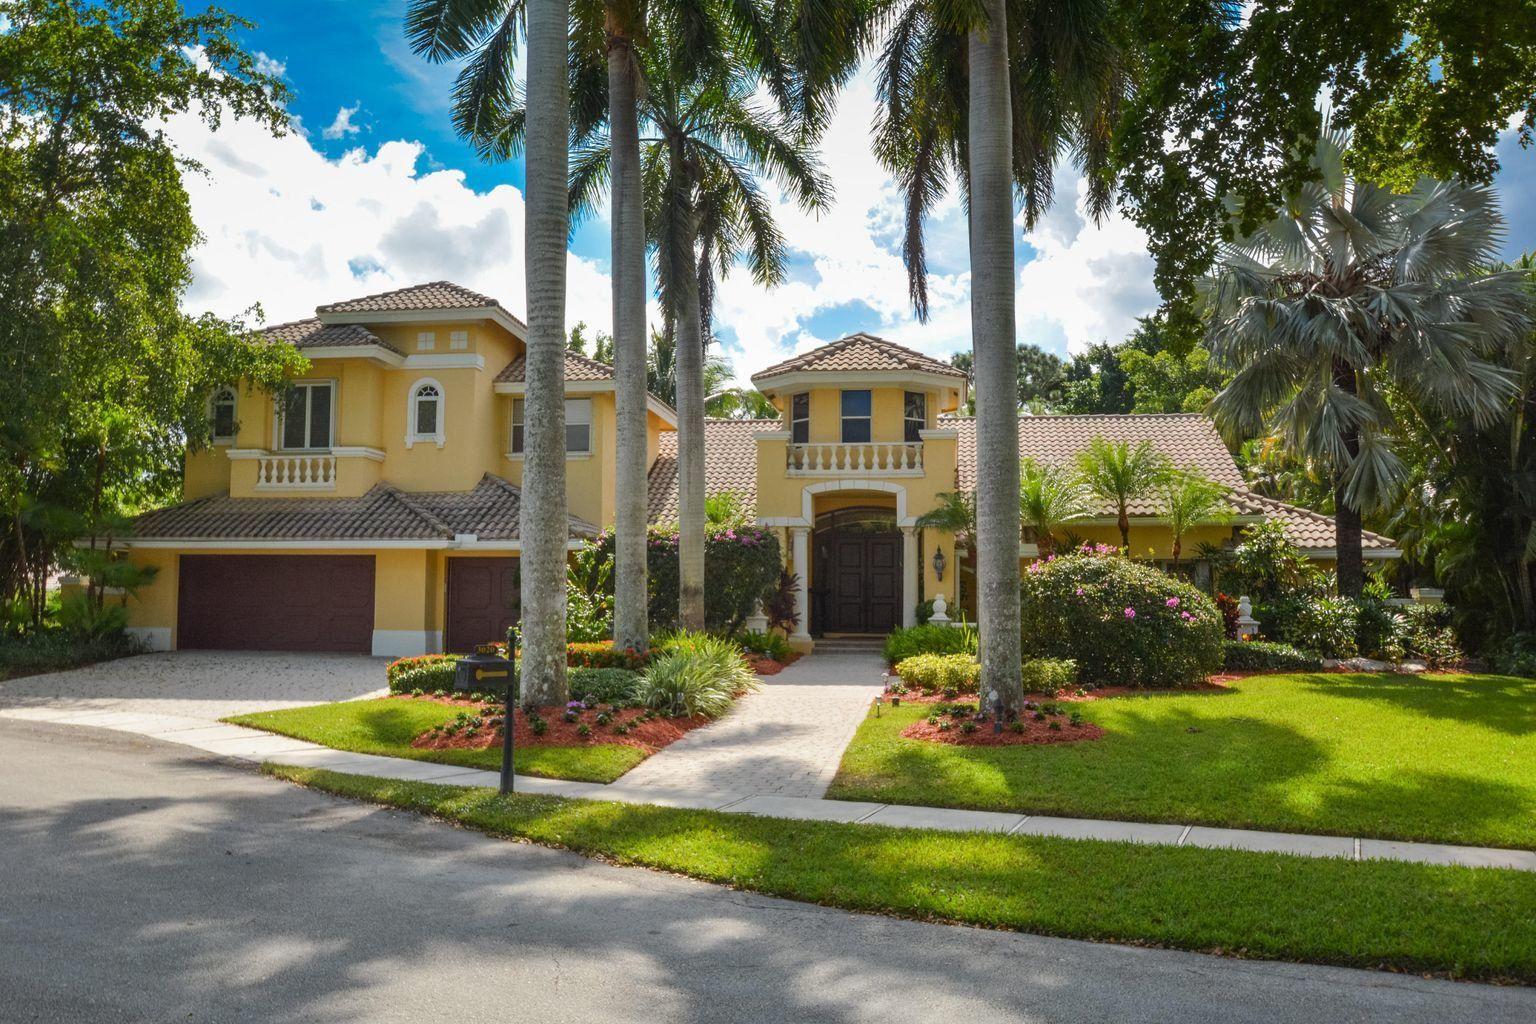 3020 Andrews Place, Boca Raton, FL 33434 - MLS#: RX-10709357